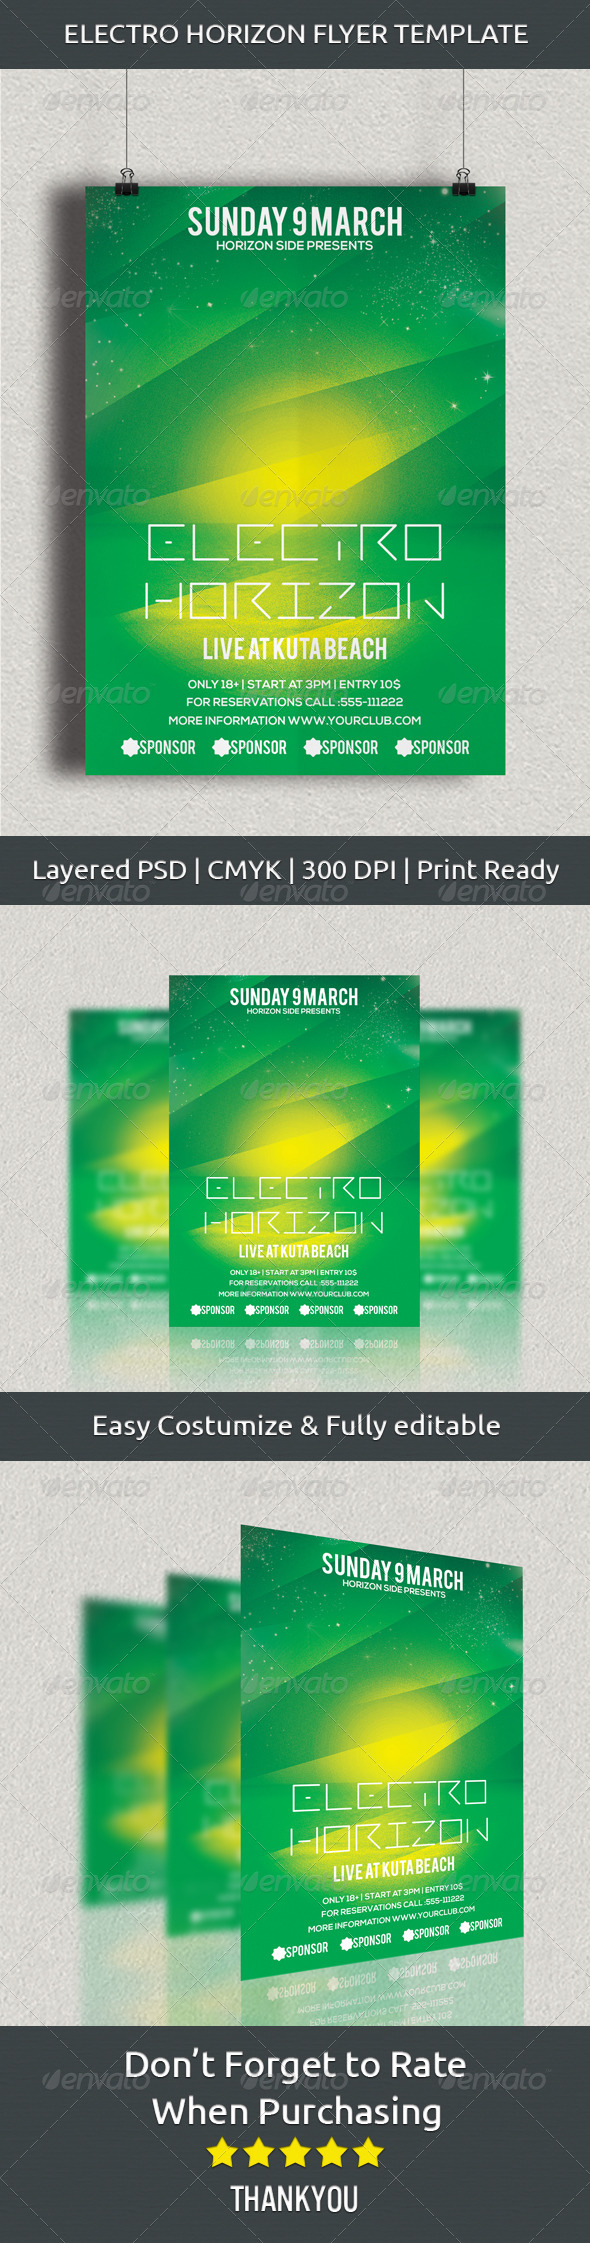 GraphicRiver Electro Horizon Flyer Template 7034914